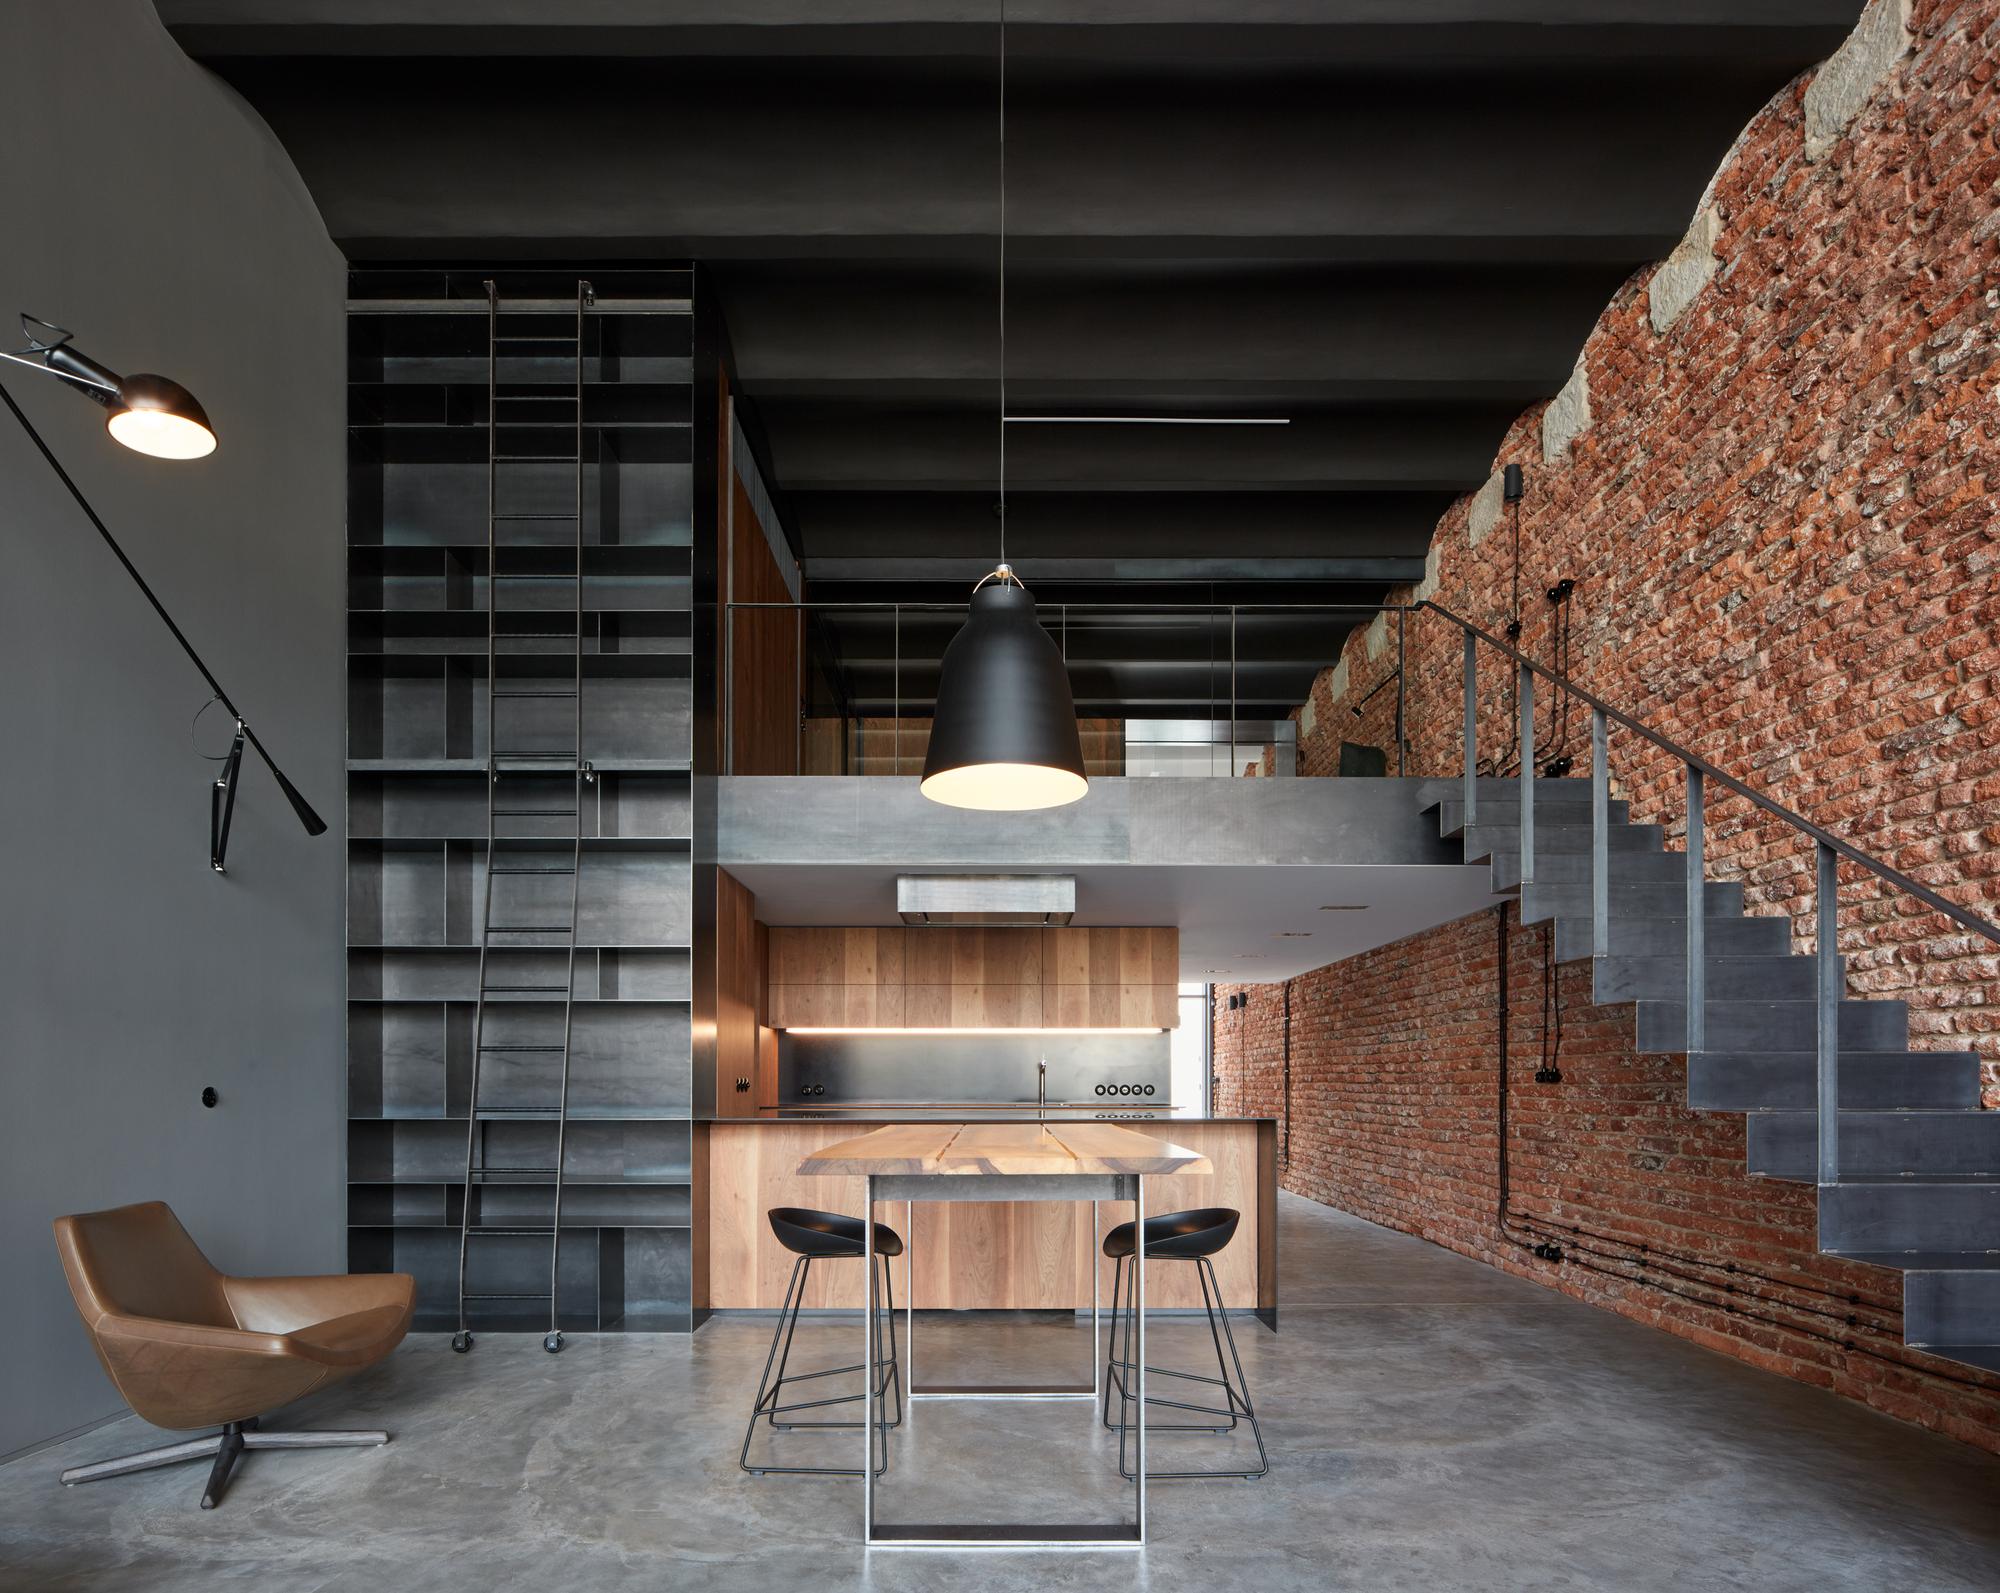 Mezzanine House Design Living Spaces